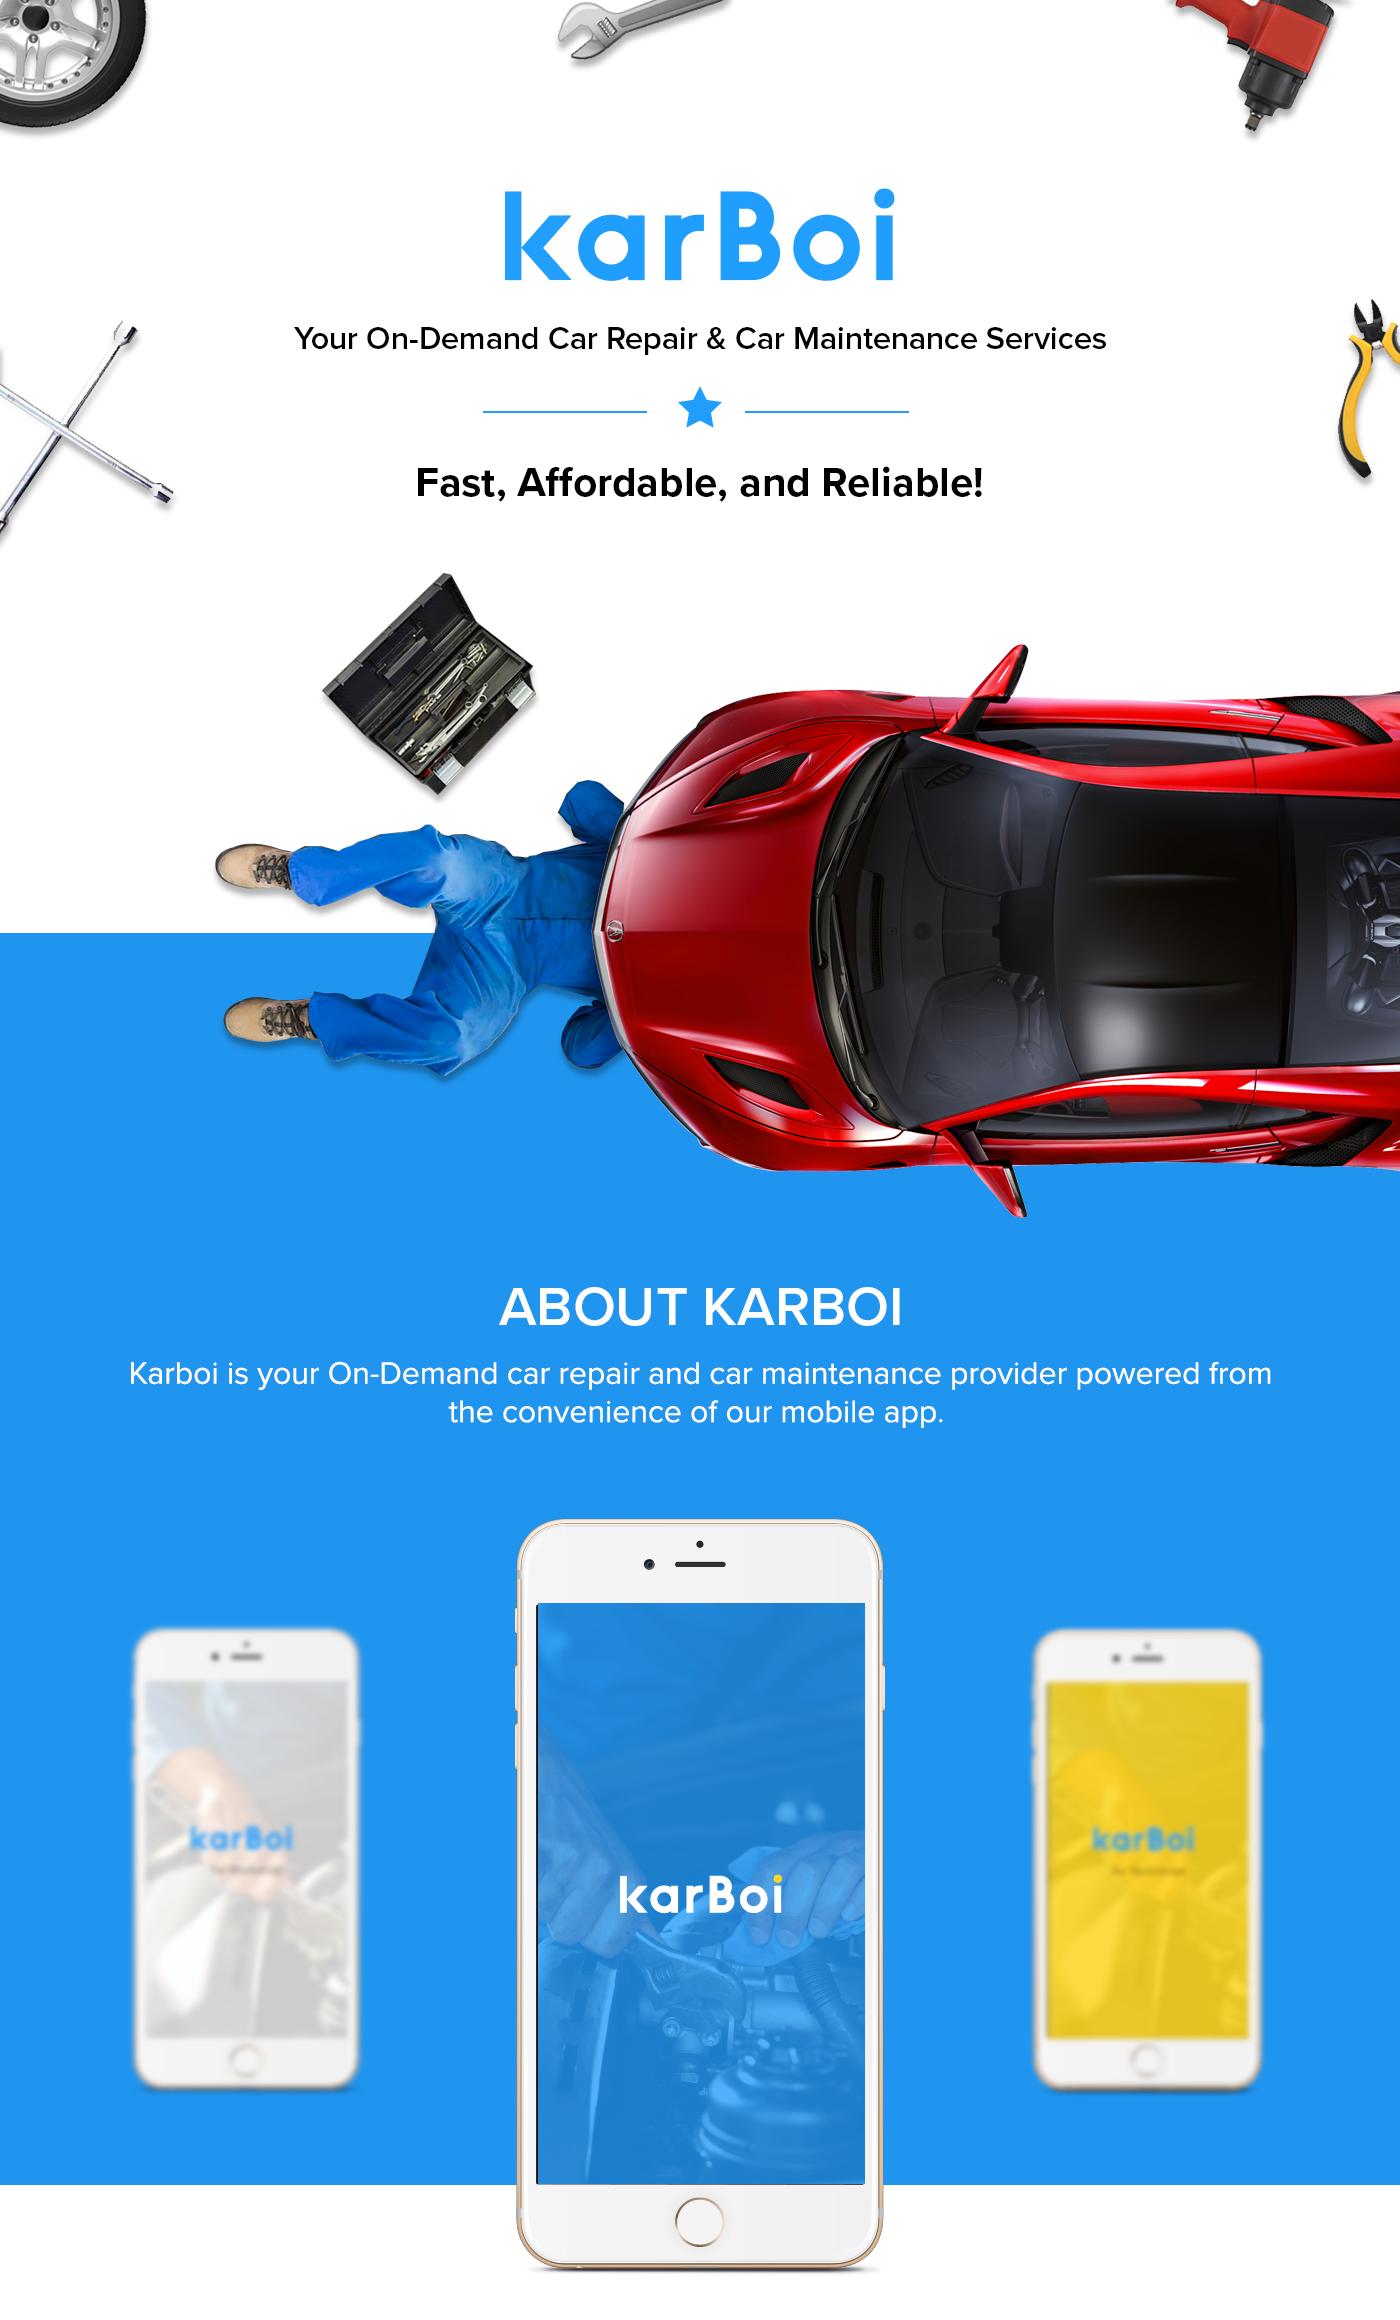 Karboi Mobile App For On Demand Car Repair Service On Behance